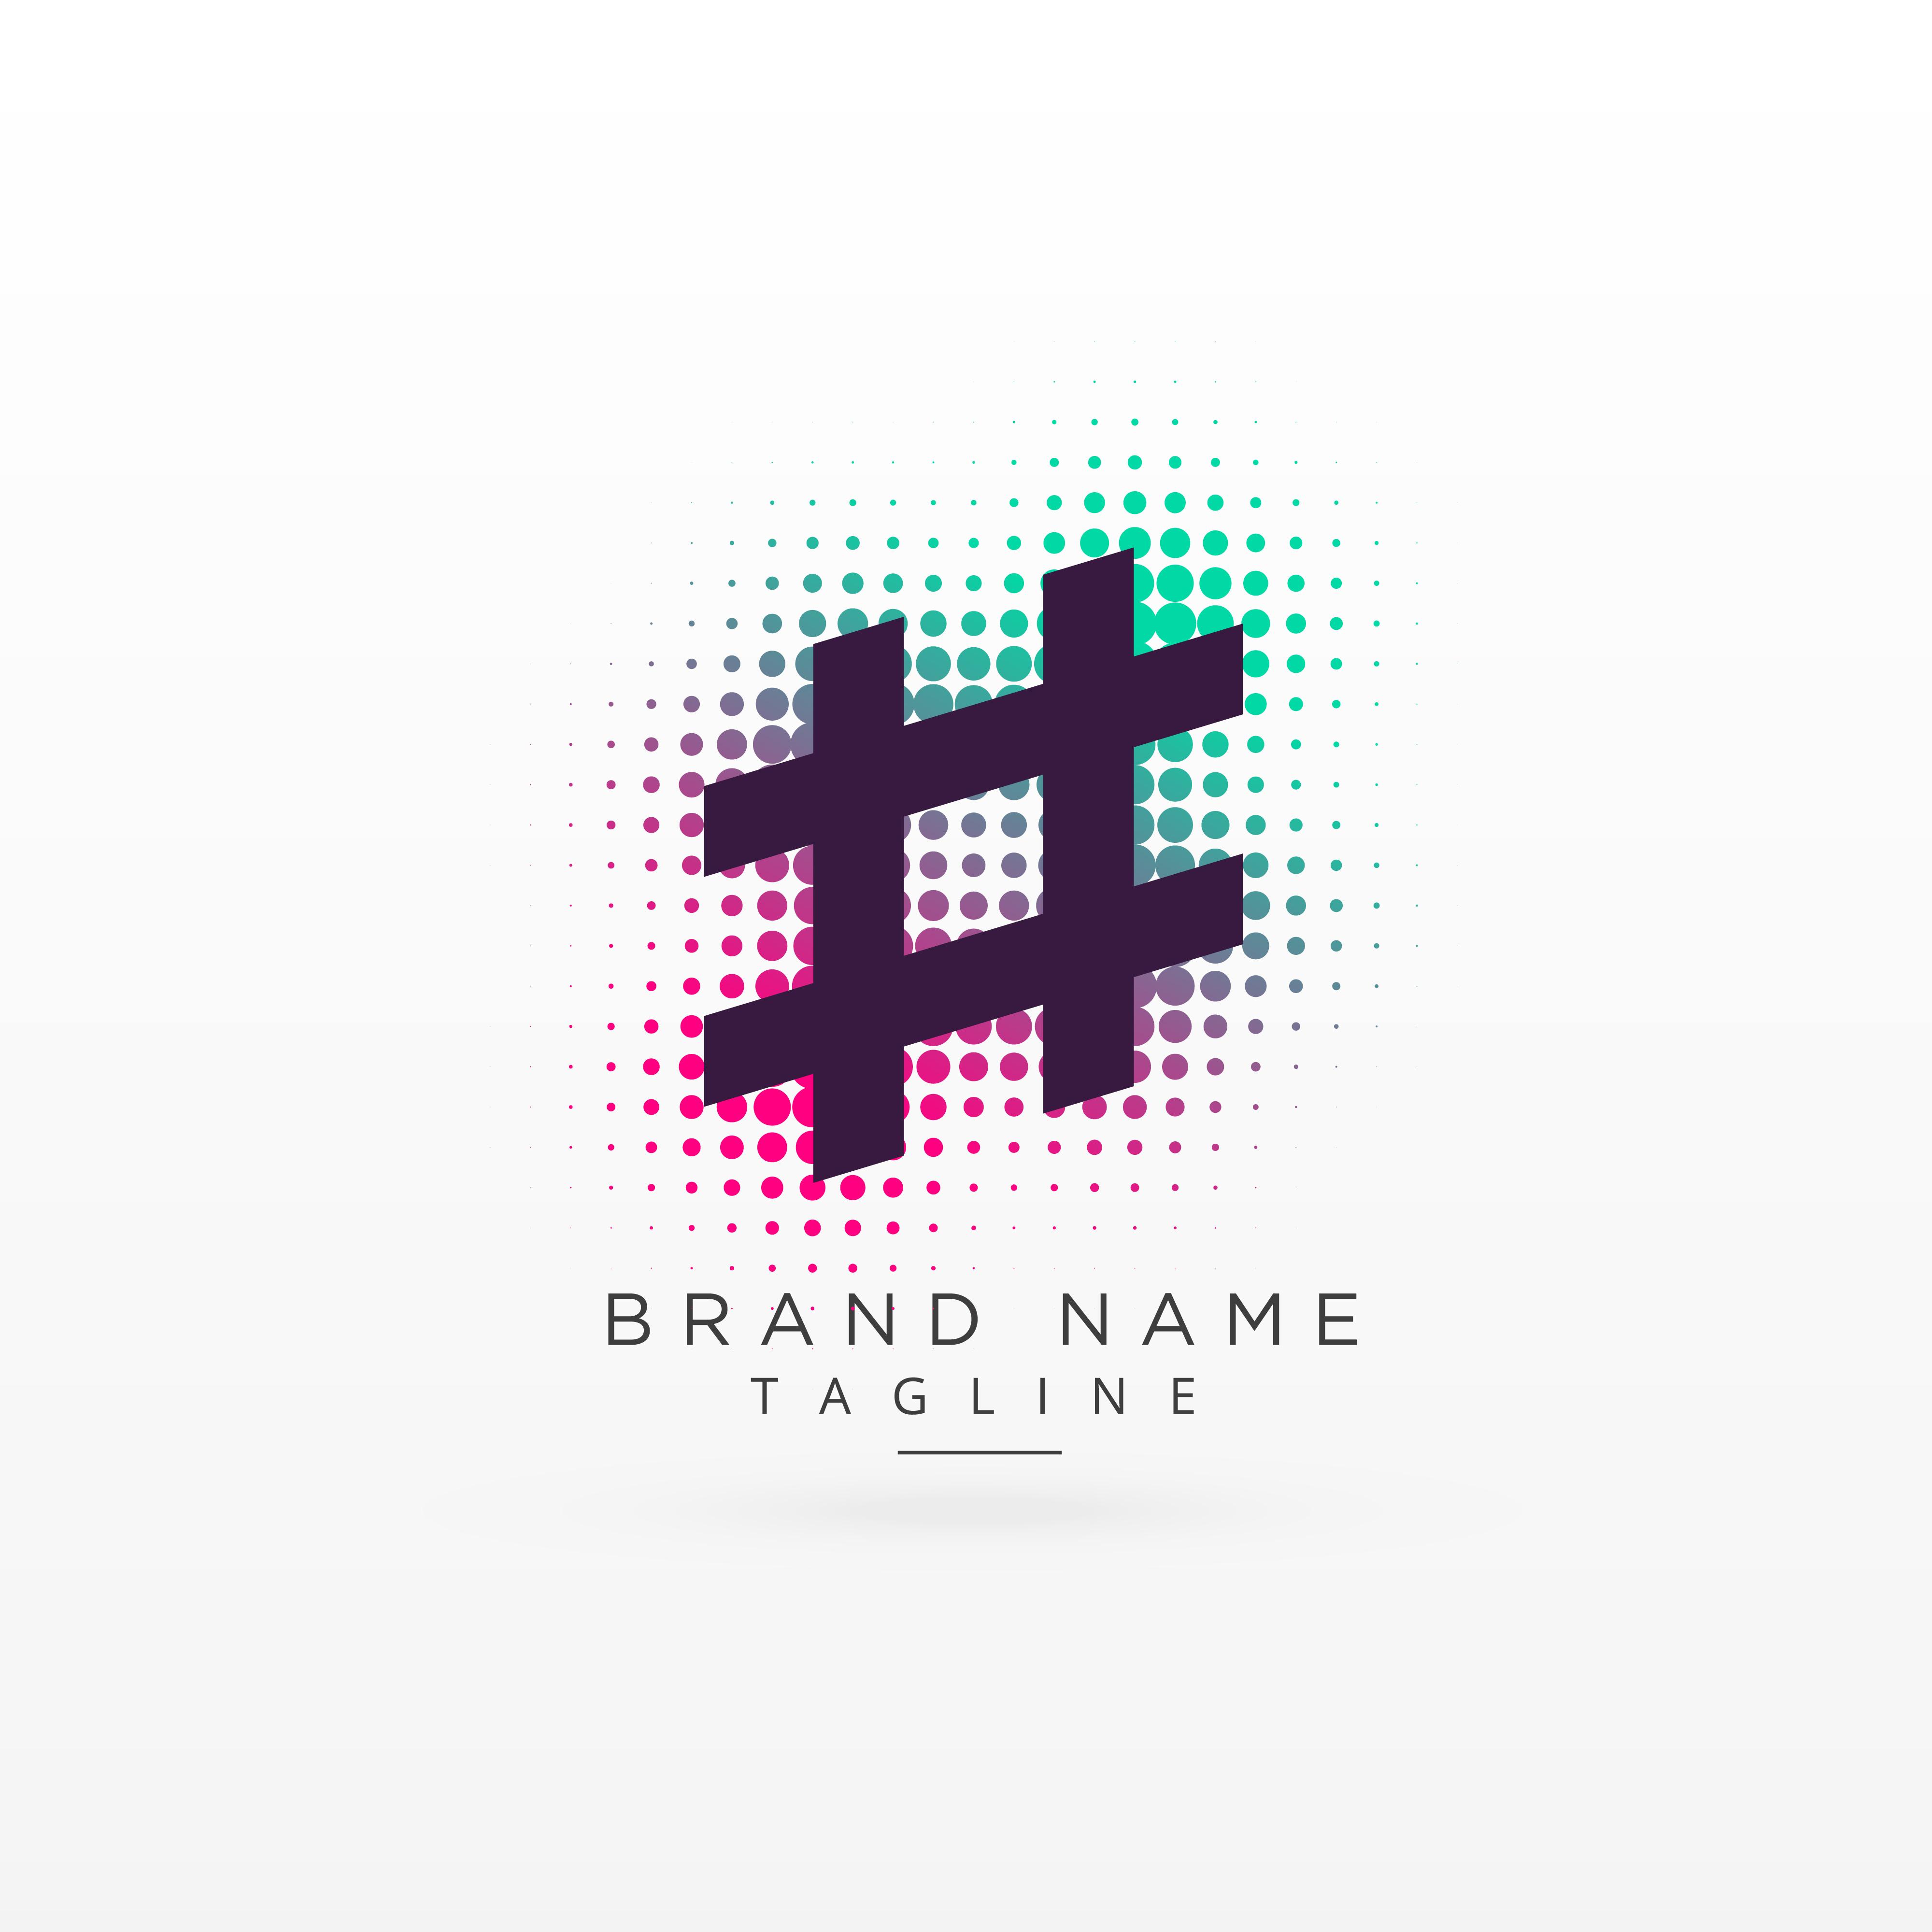 Logo Design Symbols 30675 Free Downloads